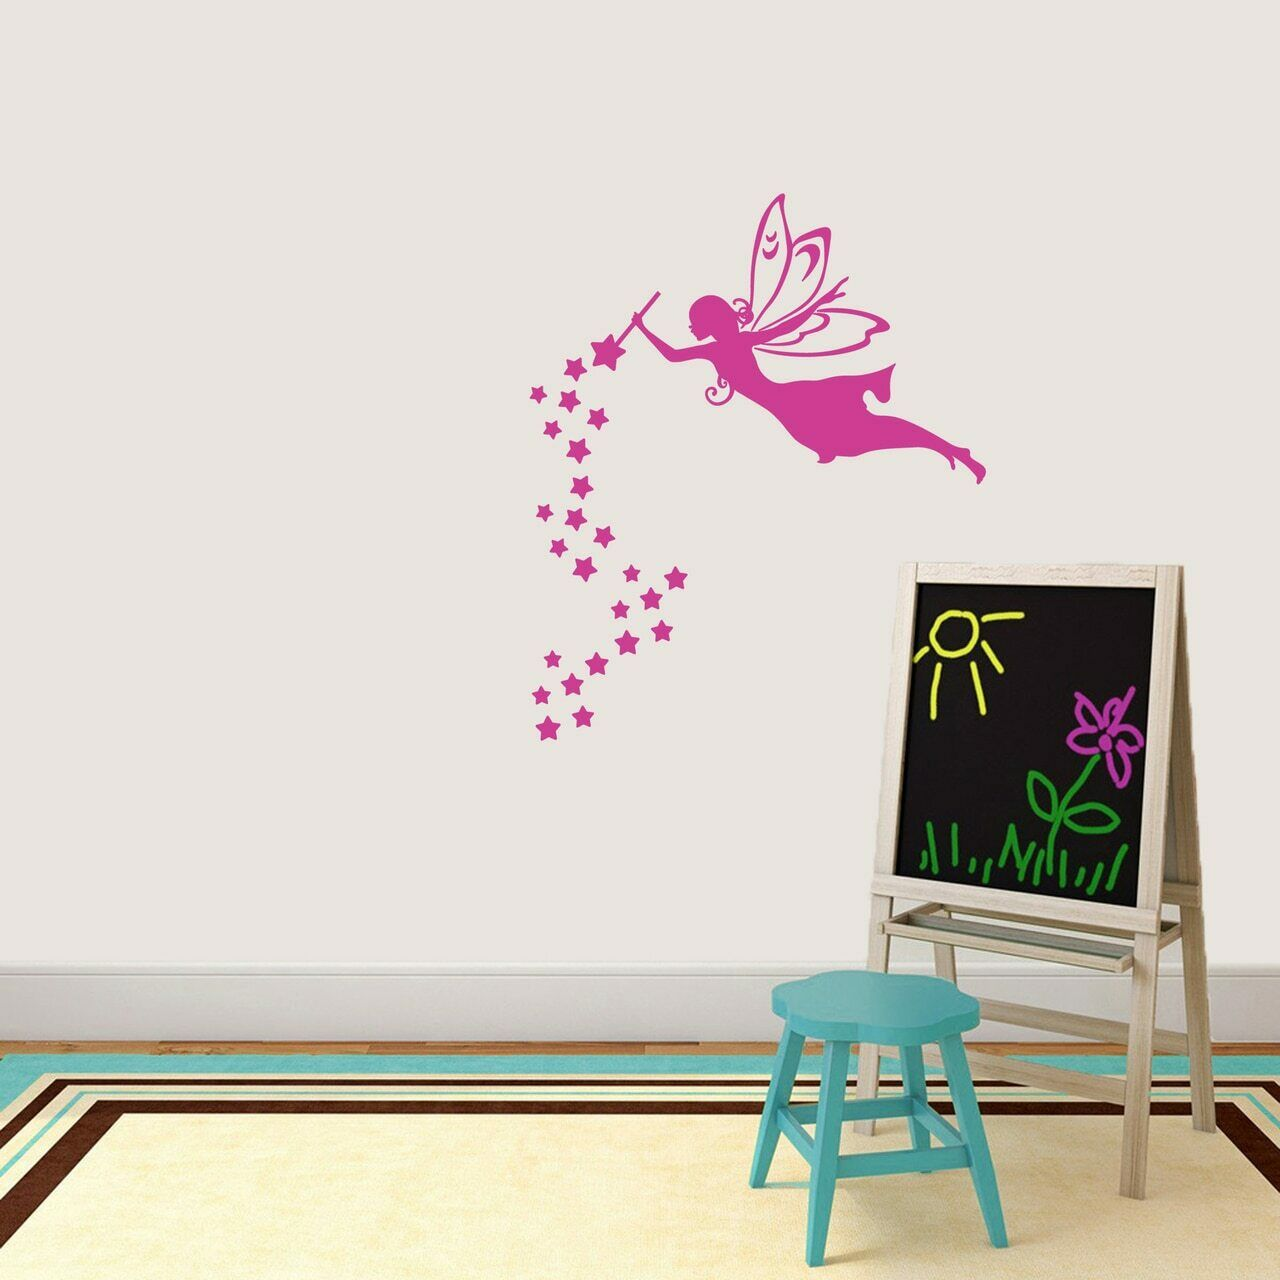 Fairy With Wand And Stars Wall Decal - Kids, Teens, Girls, Princess, Fairy Tale